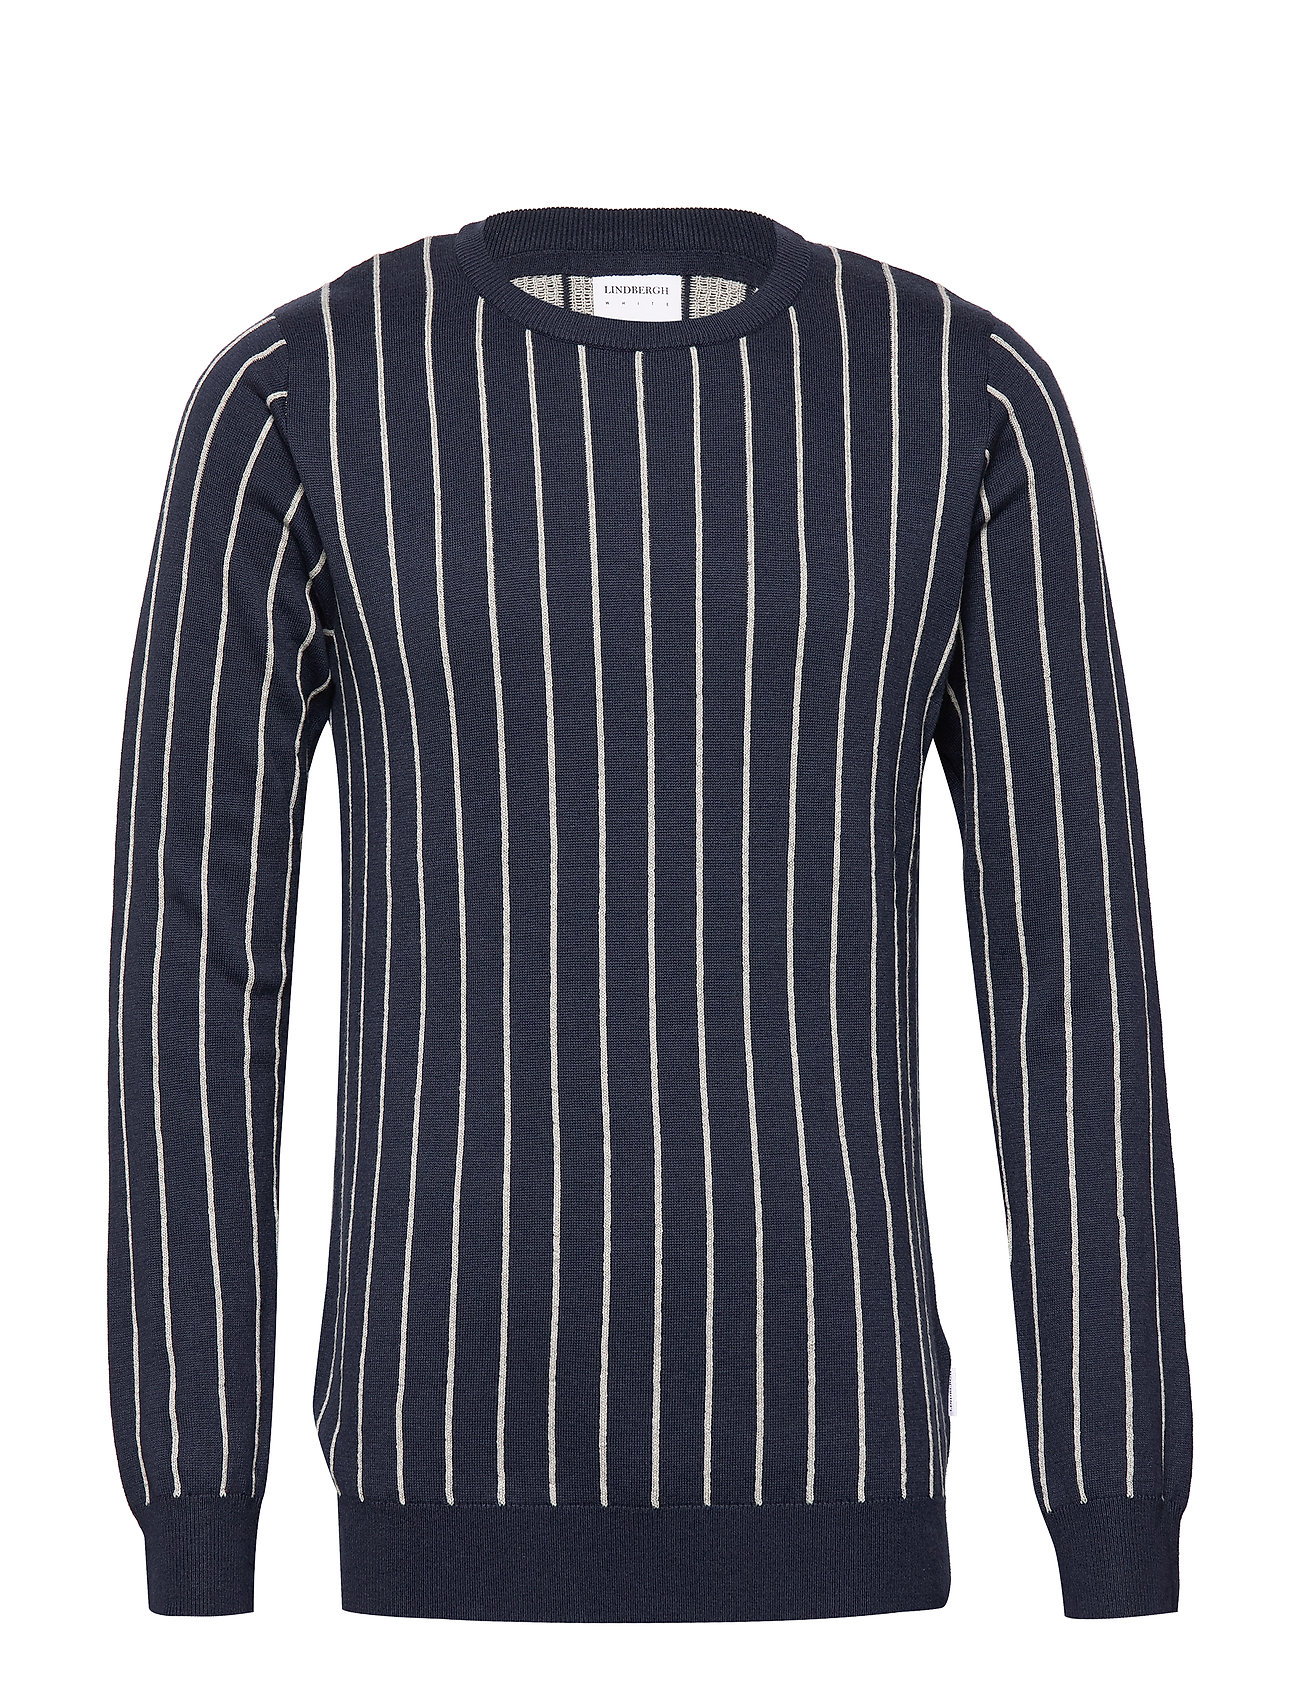 Lindbergh Vertical stripe knit - DK BLUE